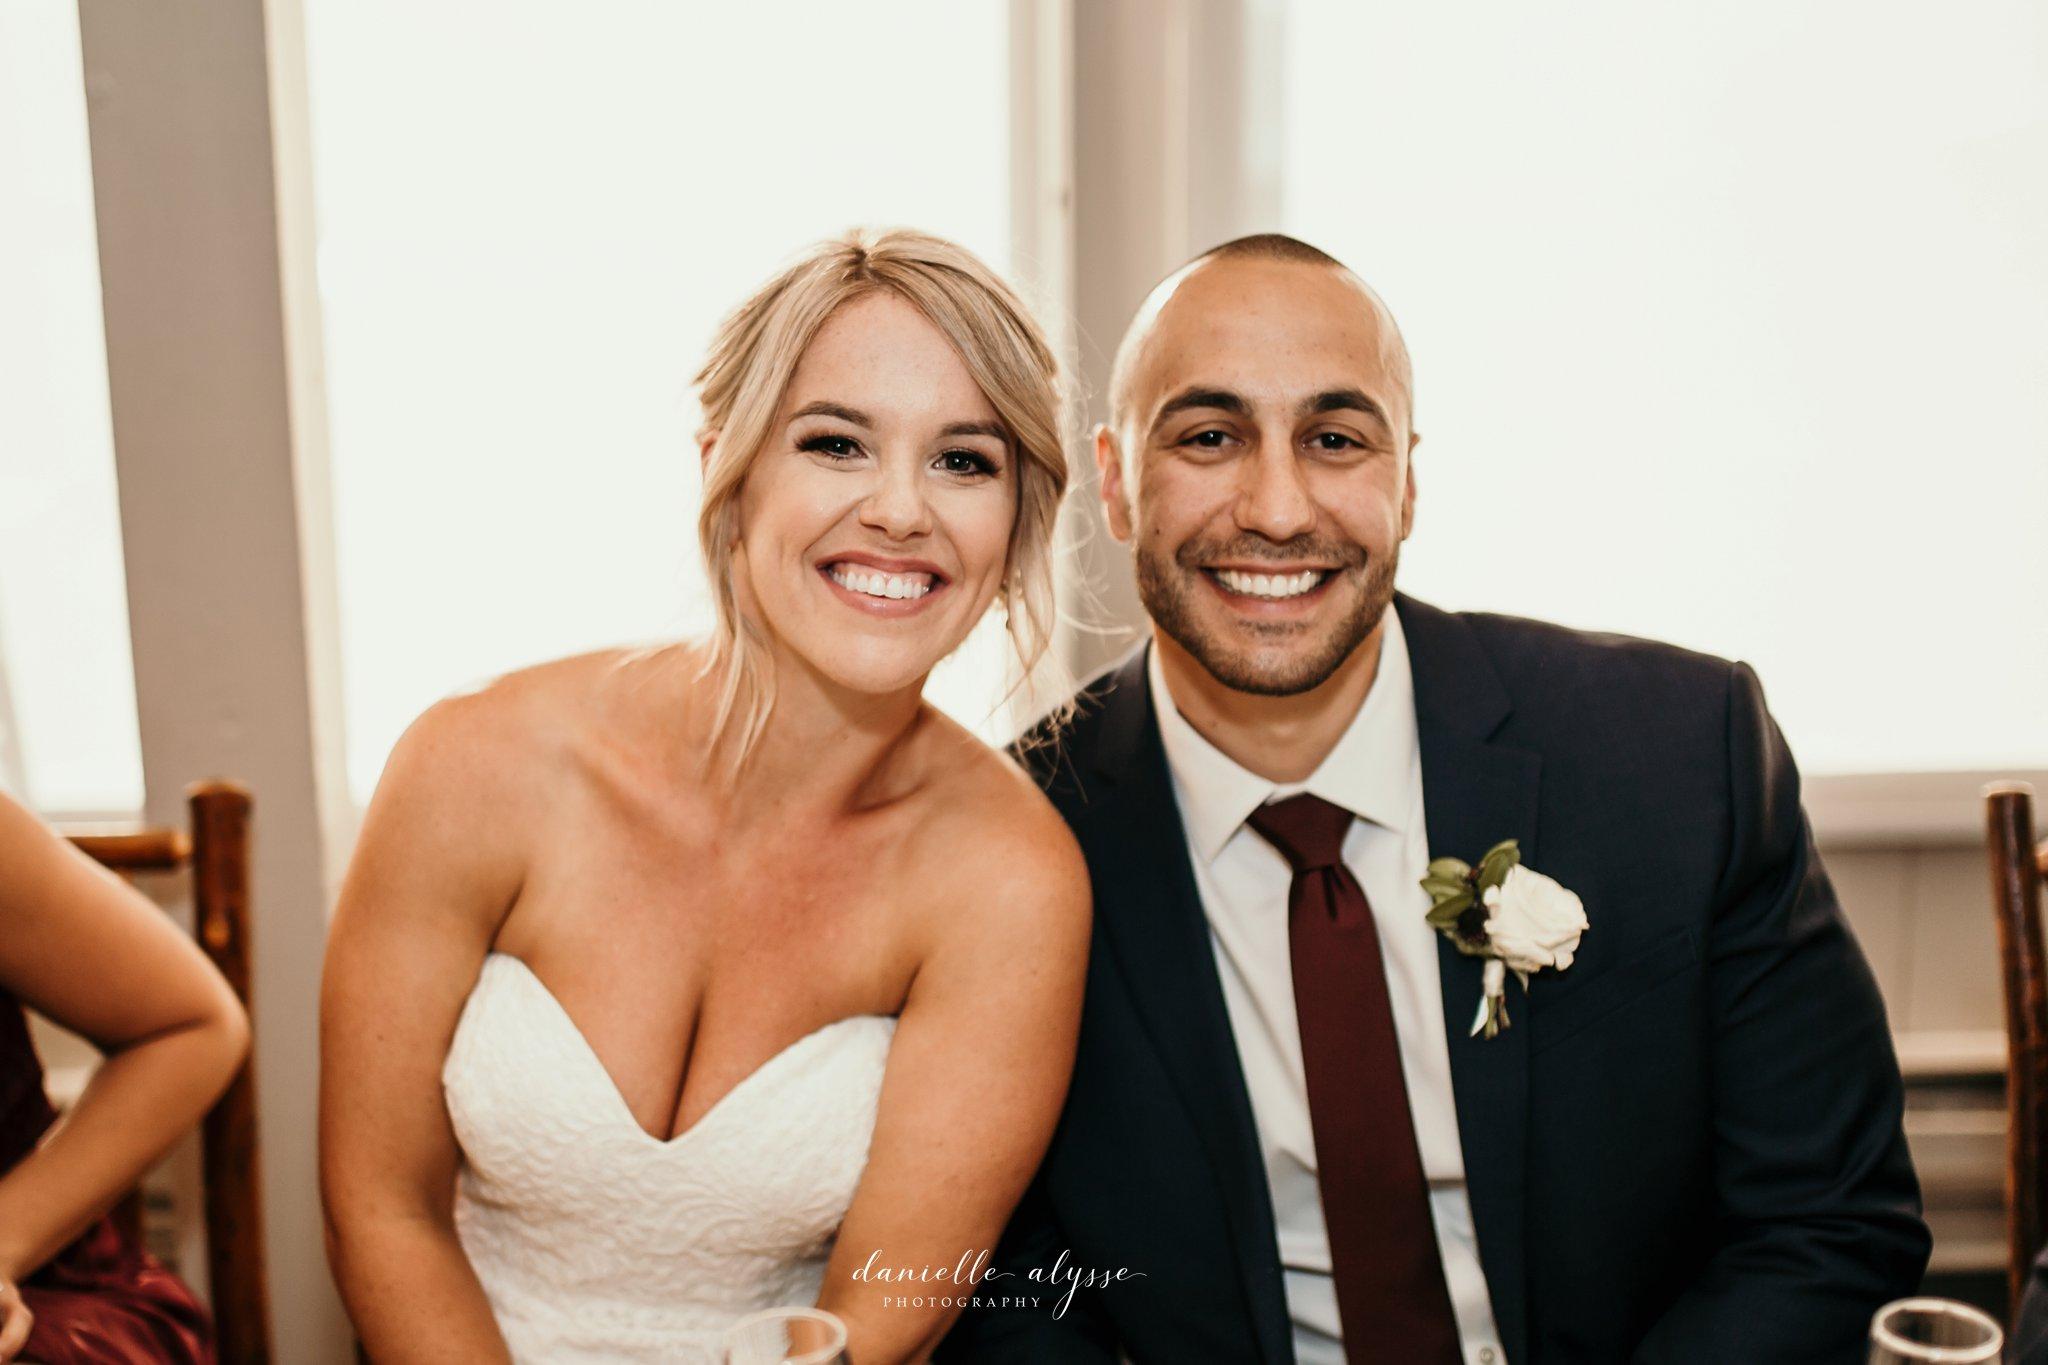 180831_wedding_stephanie_heavenly_south_lake_tahoe_danielle_alysse_photography_destination_blog_966_WEB.jpg